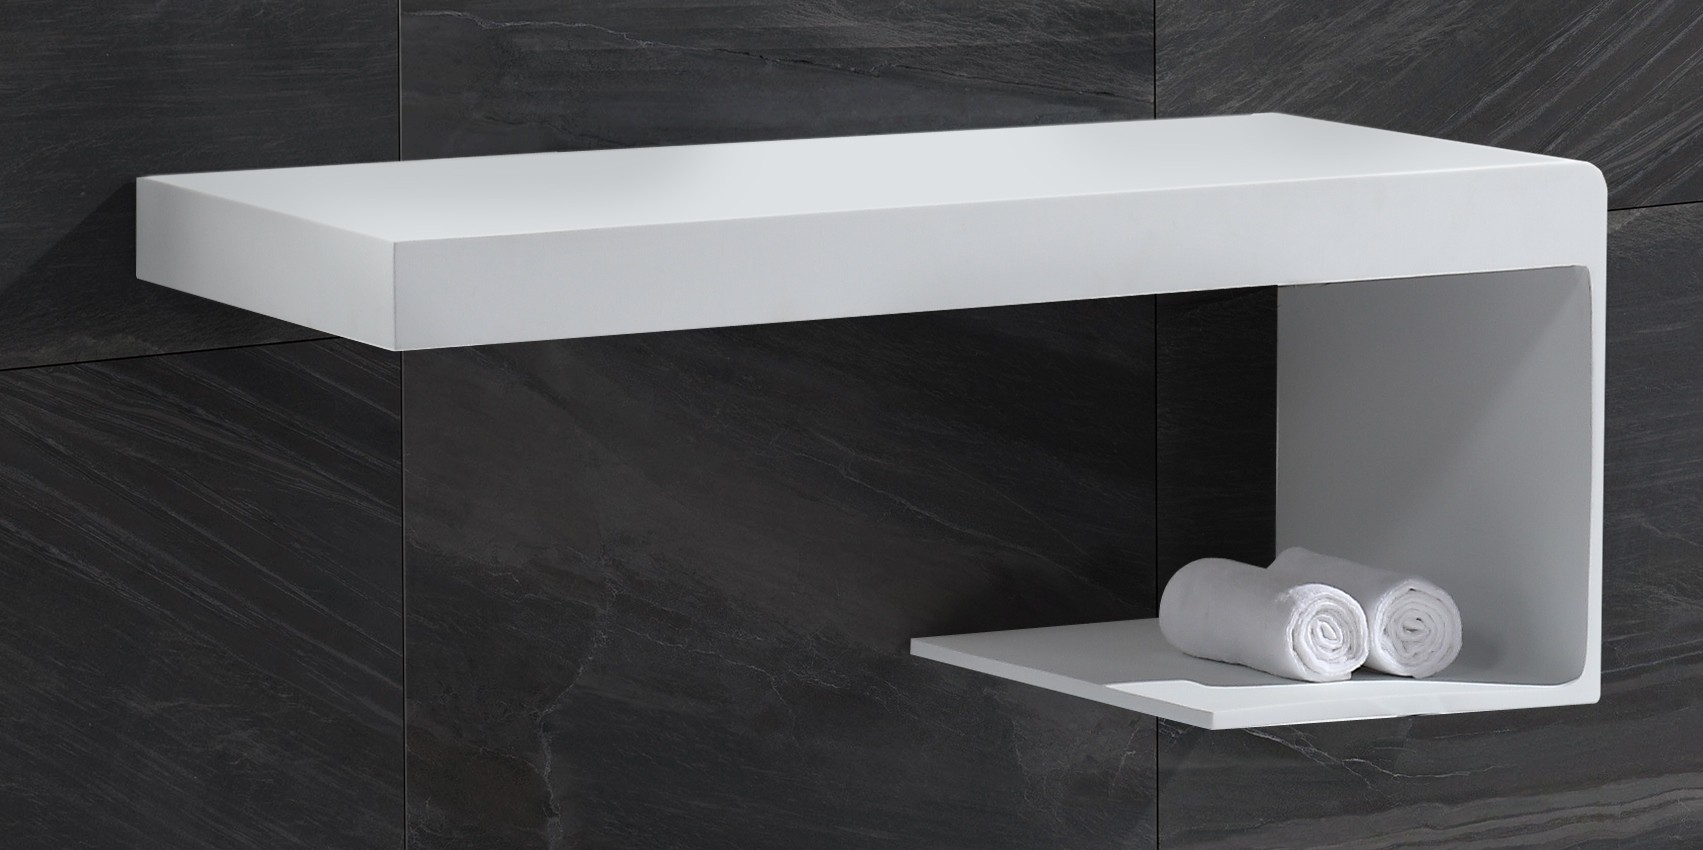 2. wahl design waschtischplatte 1396 badewelt badezimmer möbel, Badezimmer ideen